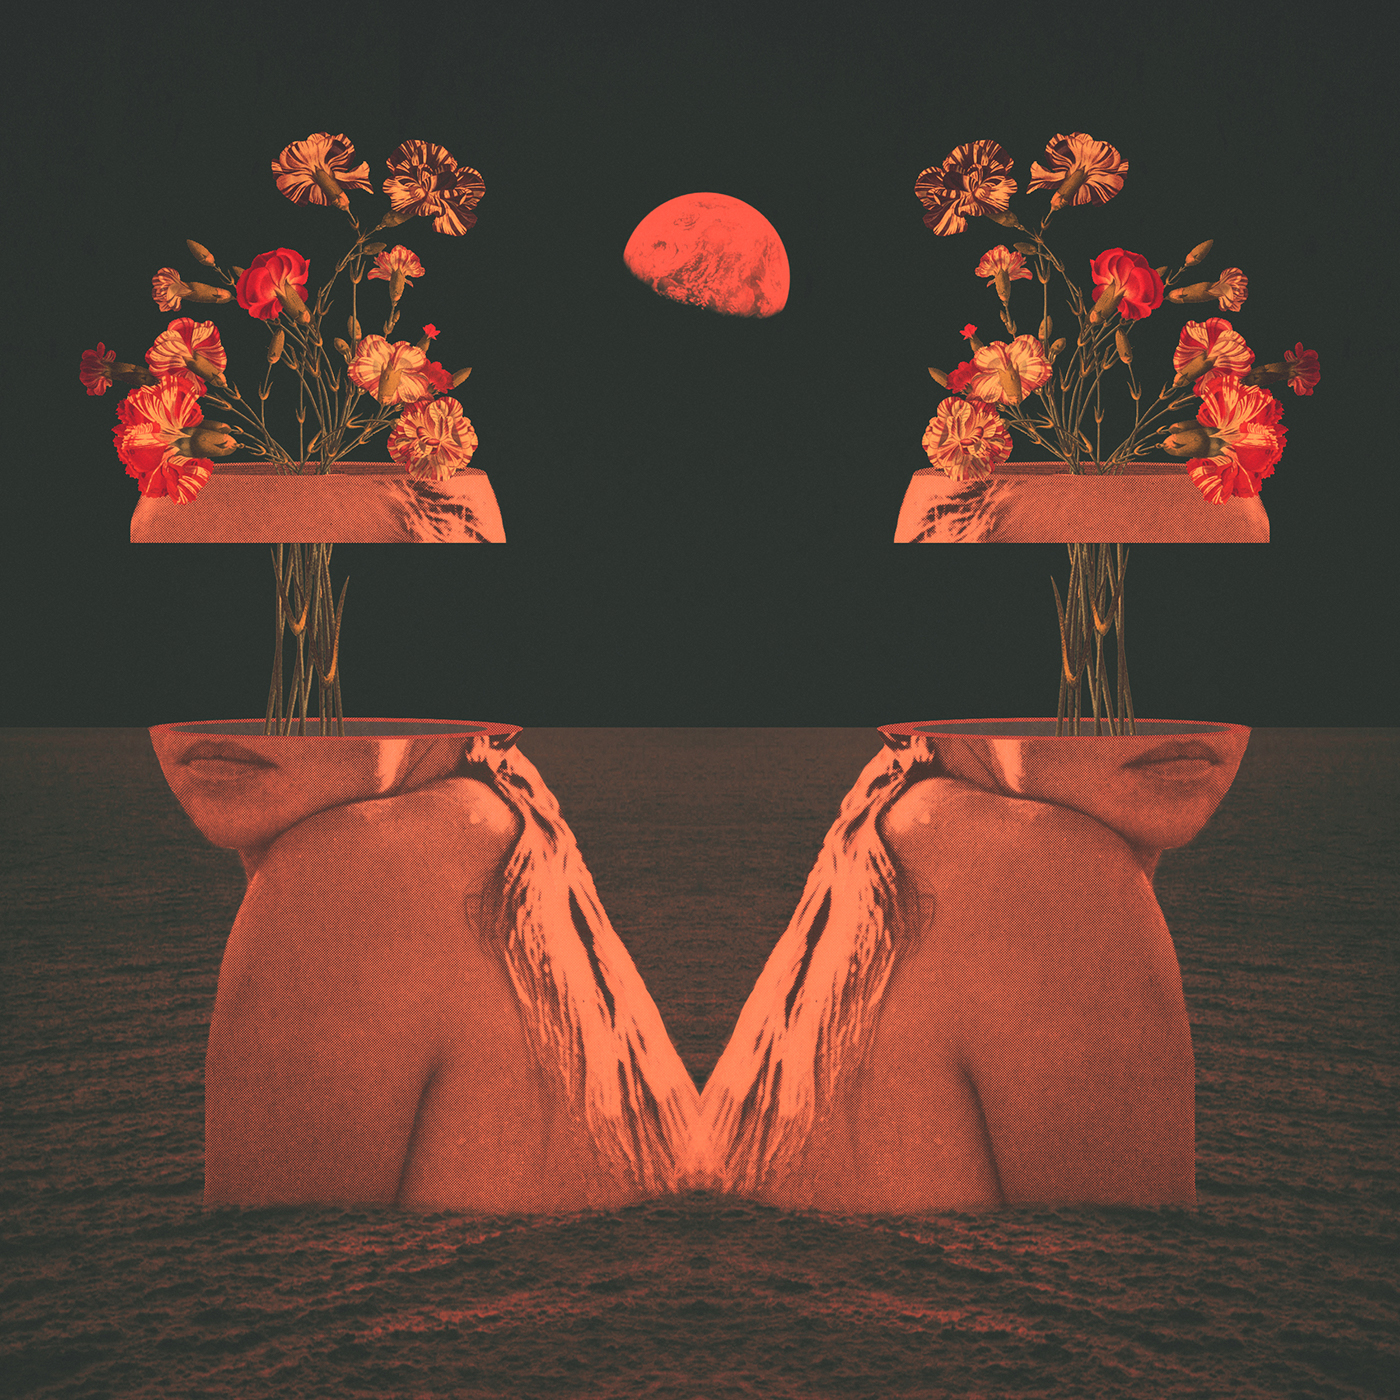 Birthday sex album artwork, lesbians seduction porn